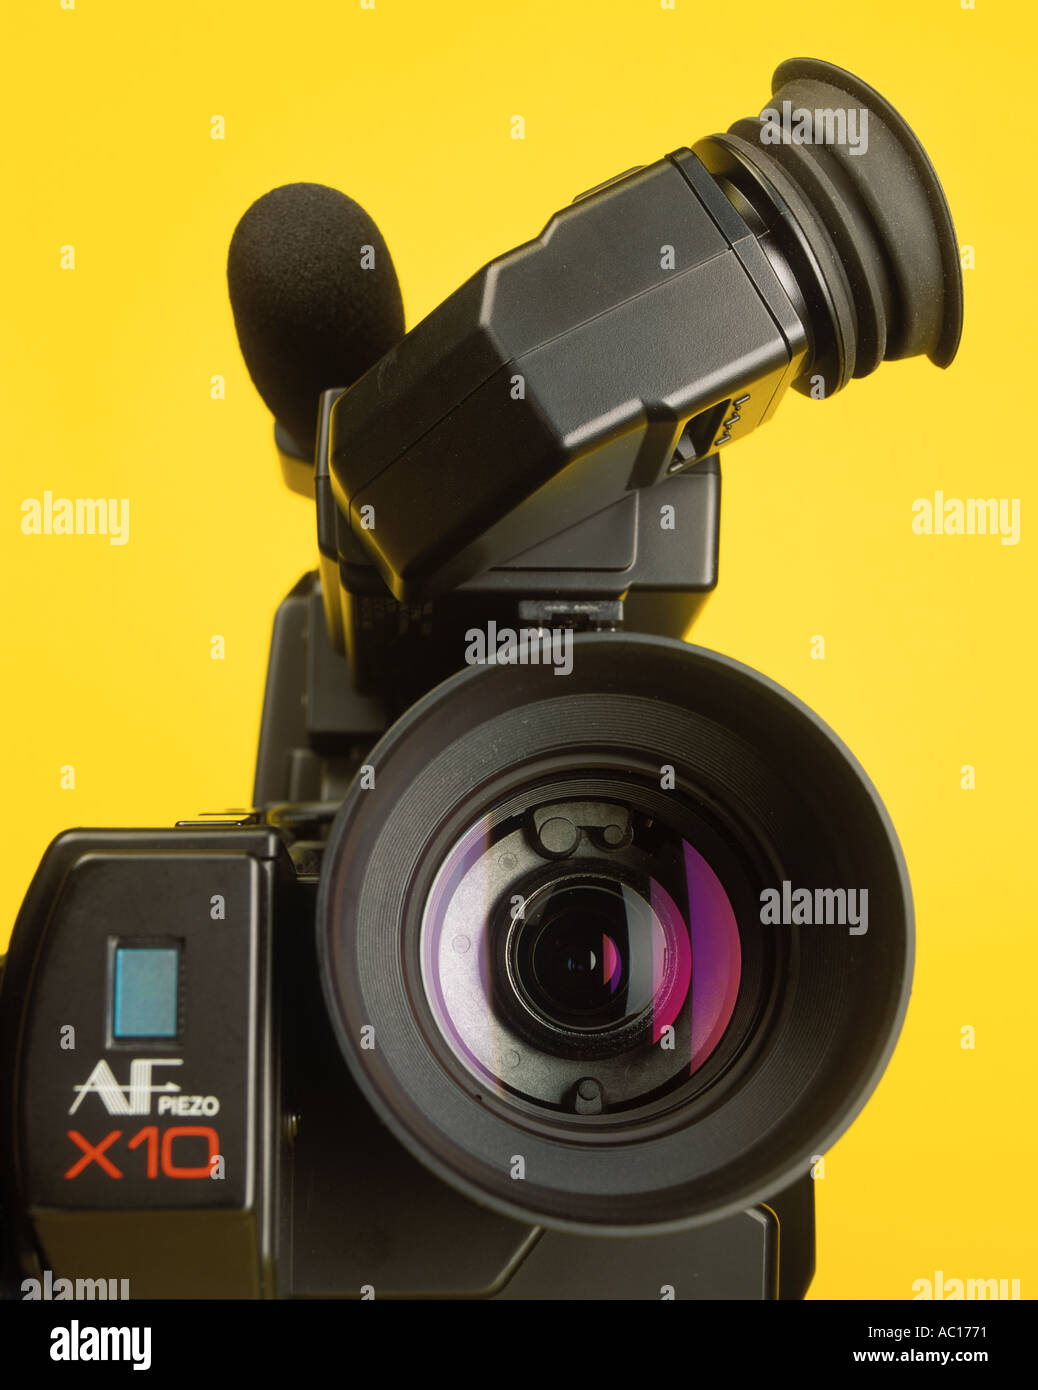 Big Brother Video camera - Stock Image